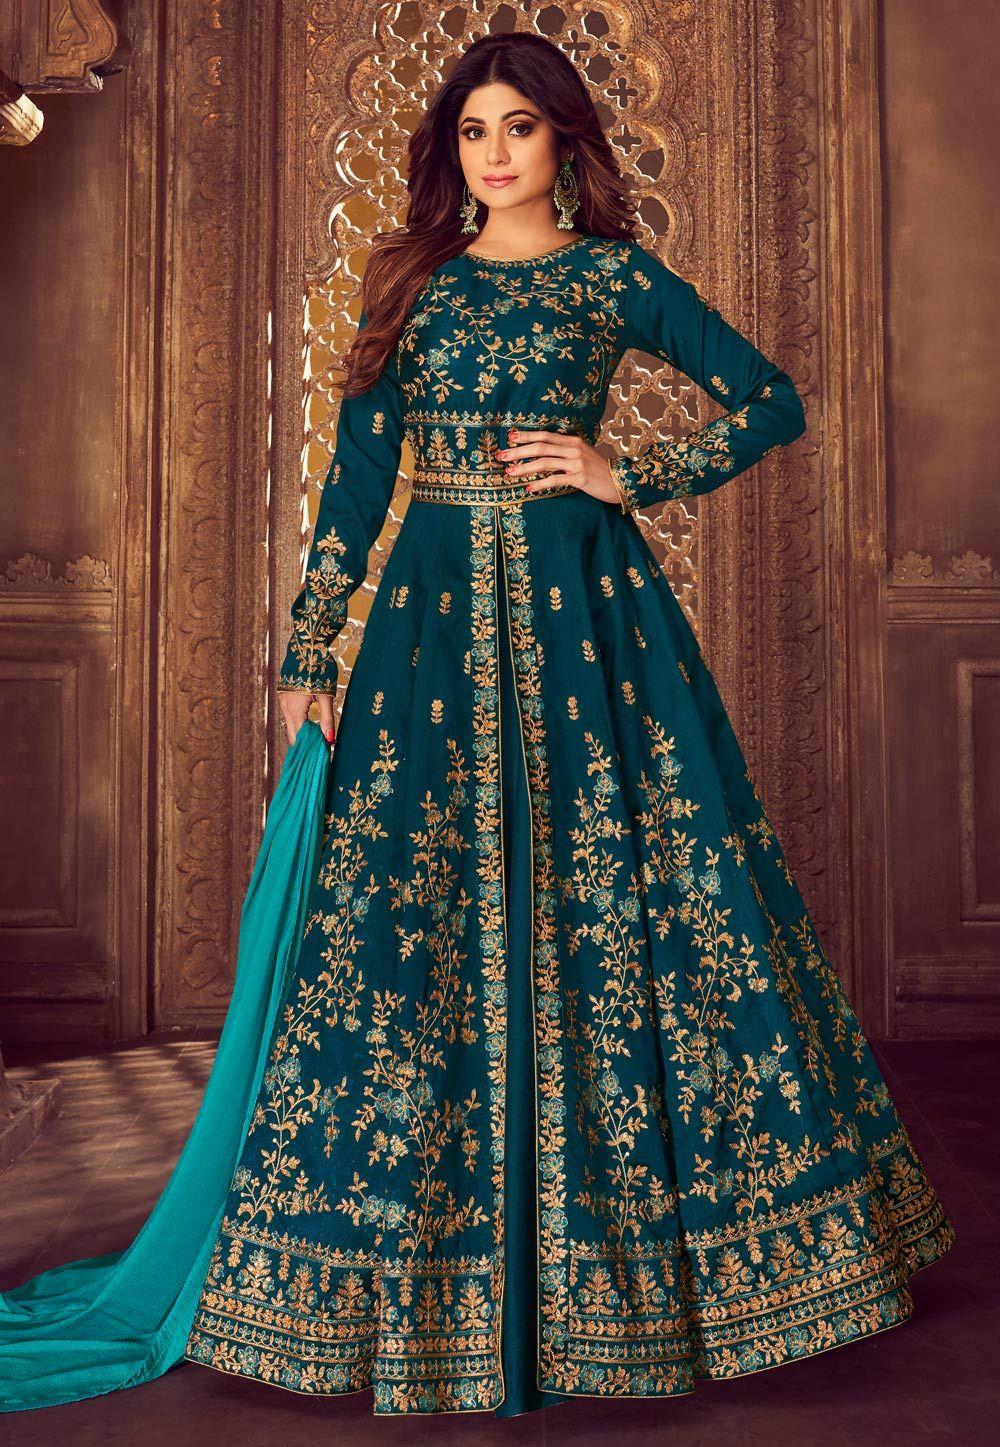 448f41a5f6 Buy Shamita Shetty Blue Silk Embroidered Long Choli Lehenga 167897 online  at best price from vast